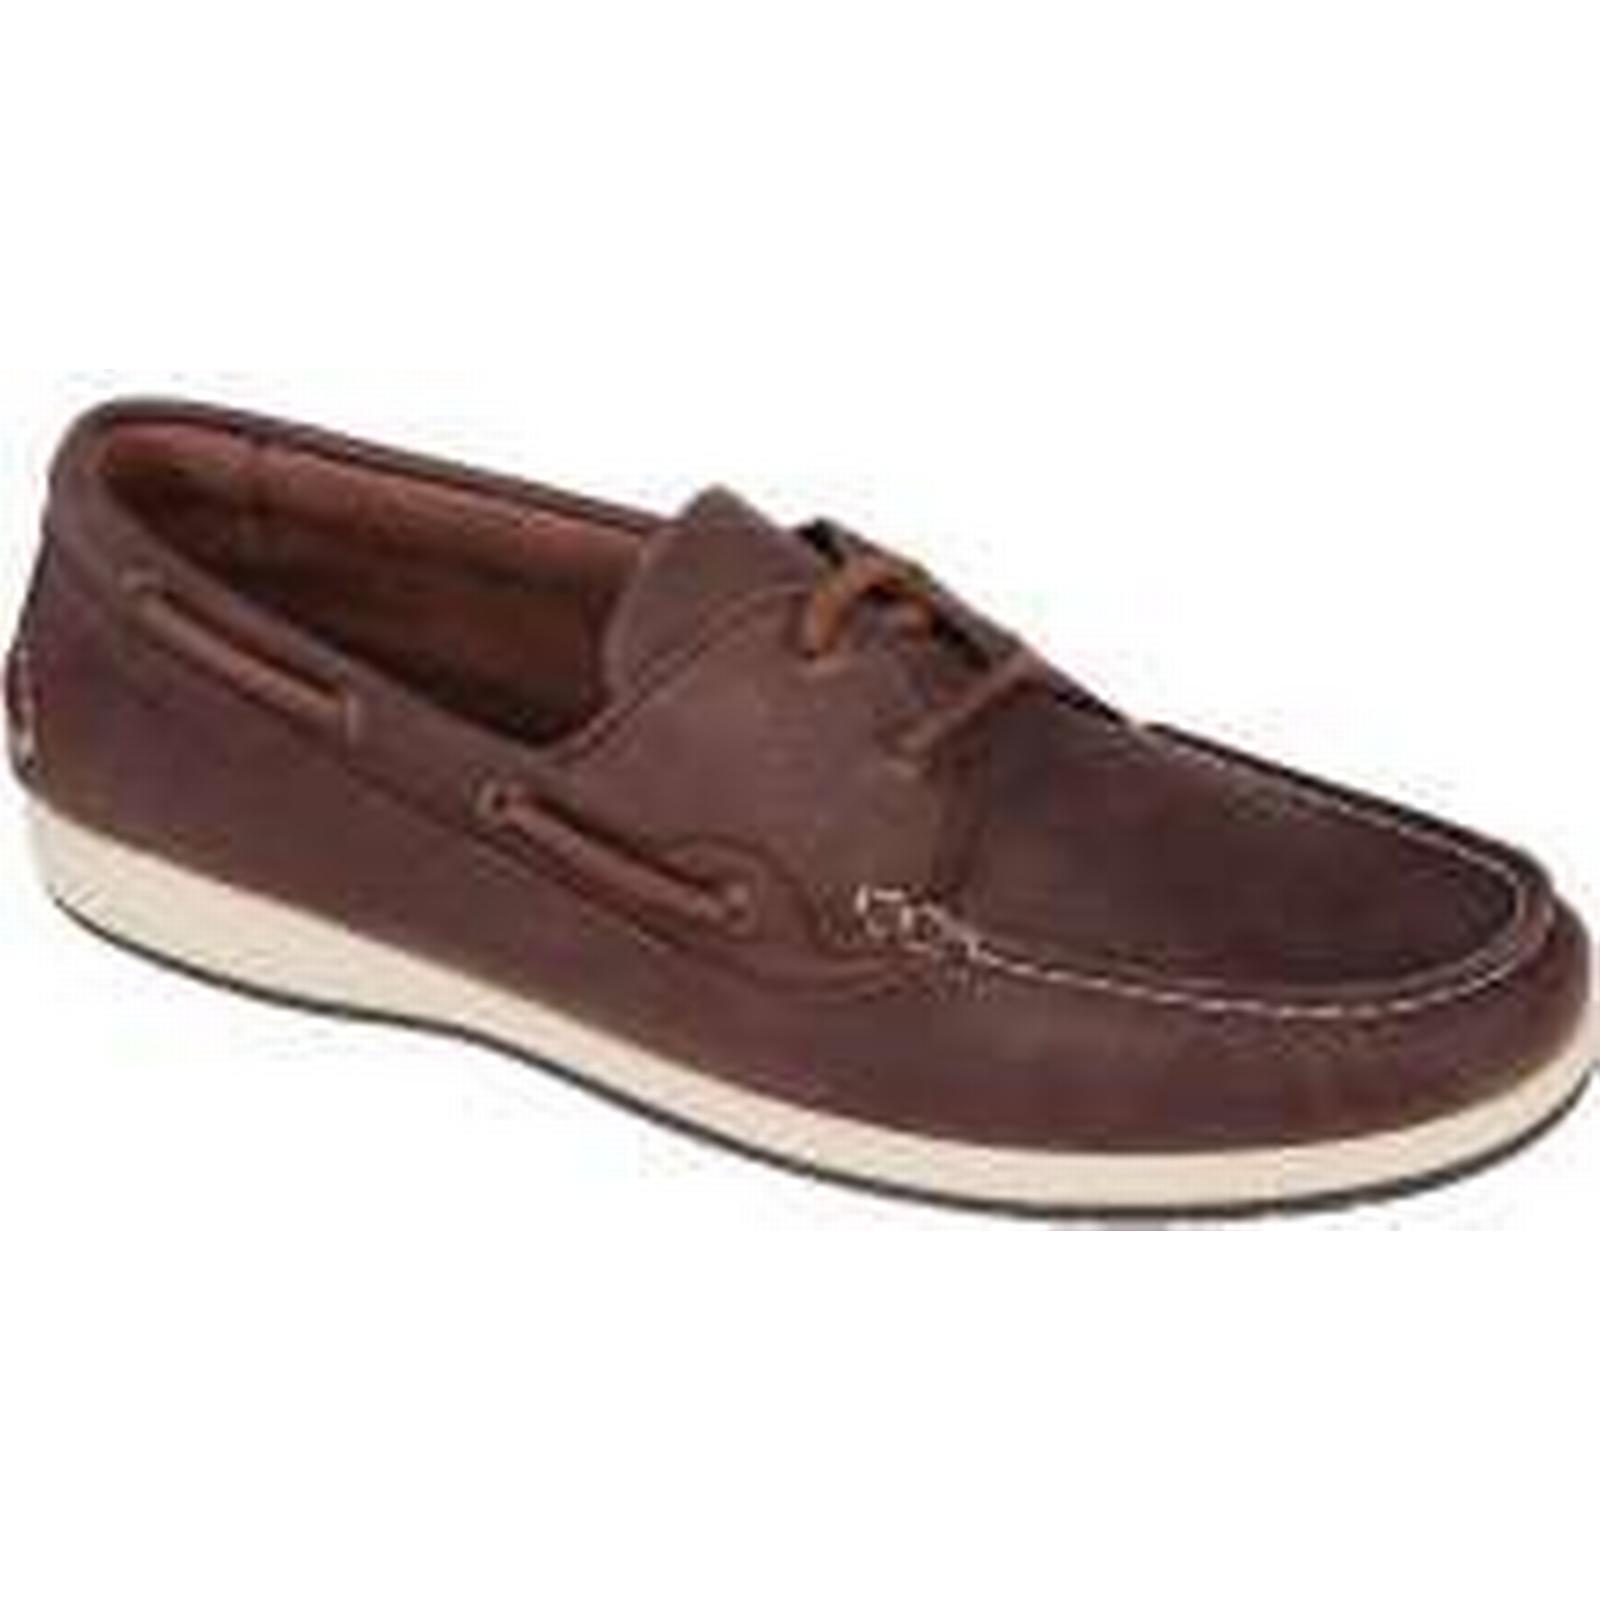 Dubarry Pacific X LT UK11 Deck Shoes, Donkey Brown, UK11 LT 3f1bfa